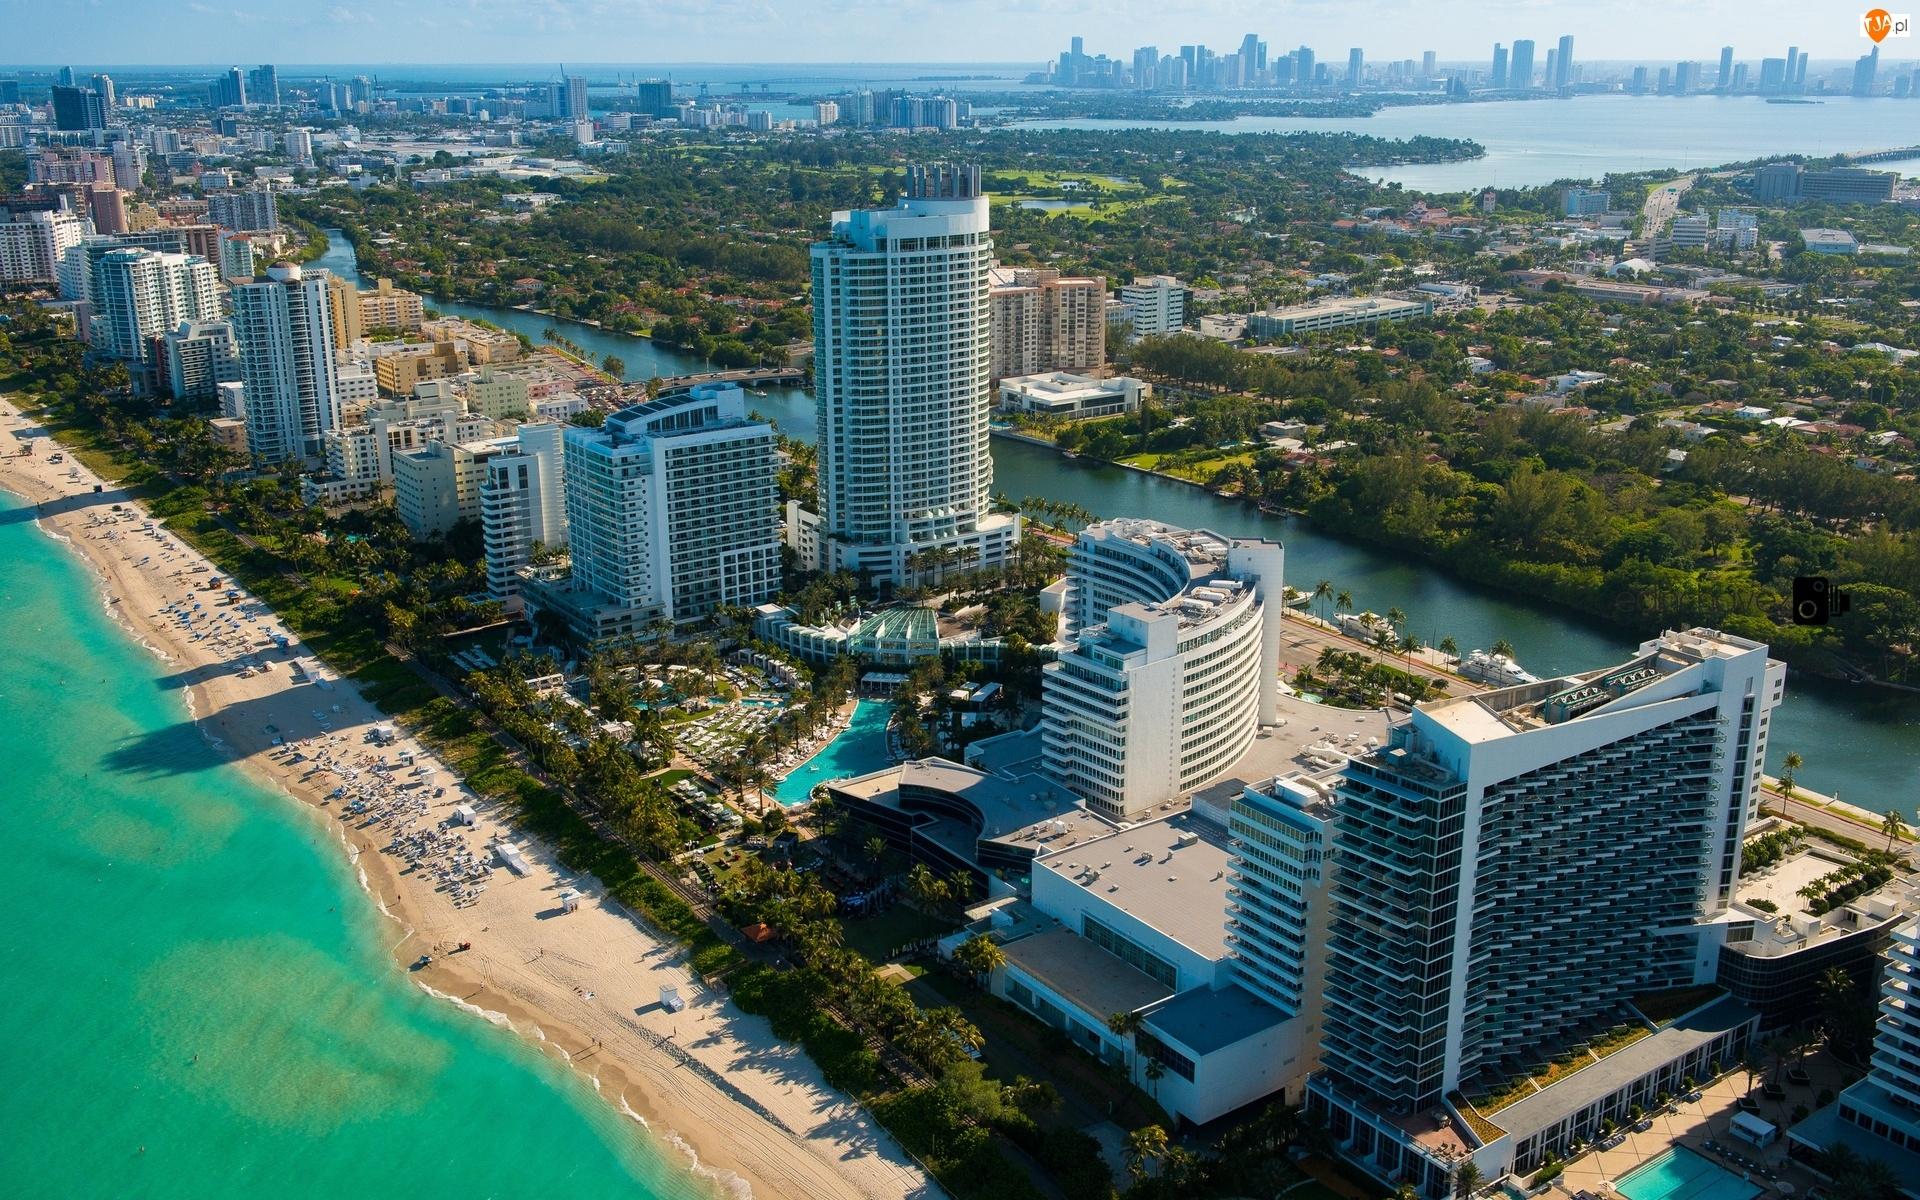 Floryda, Wieżowce, Ocean, Plaża, Miami